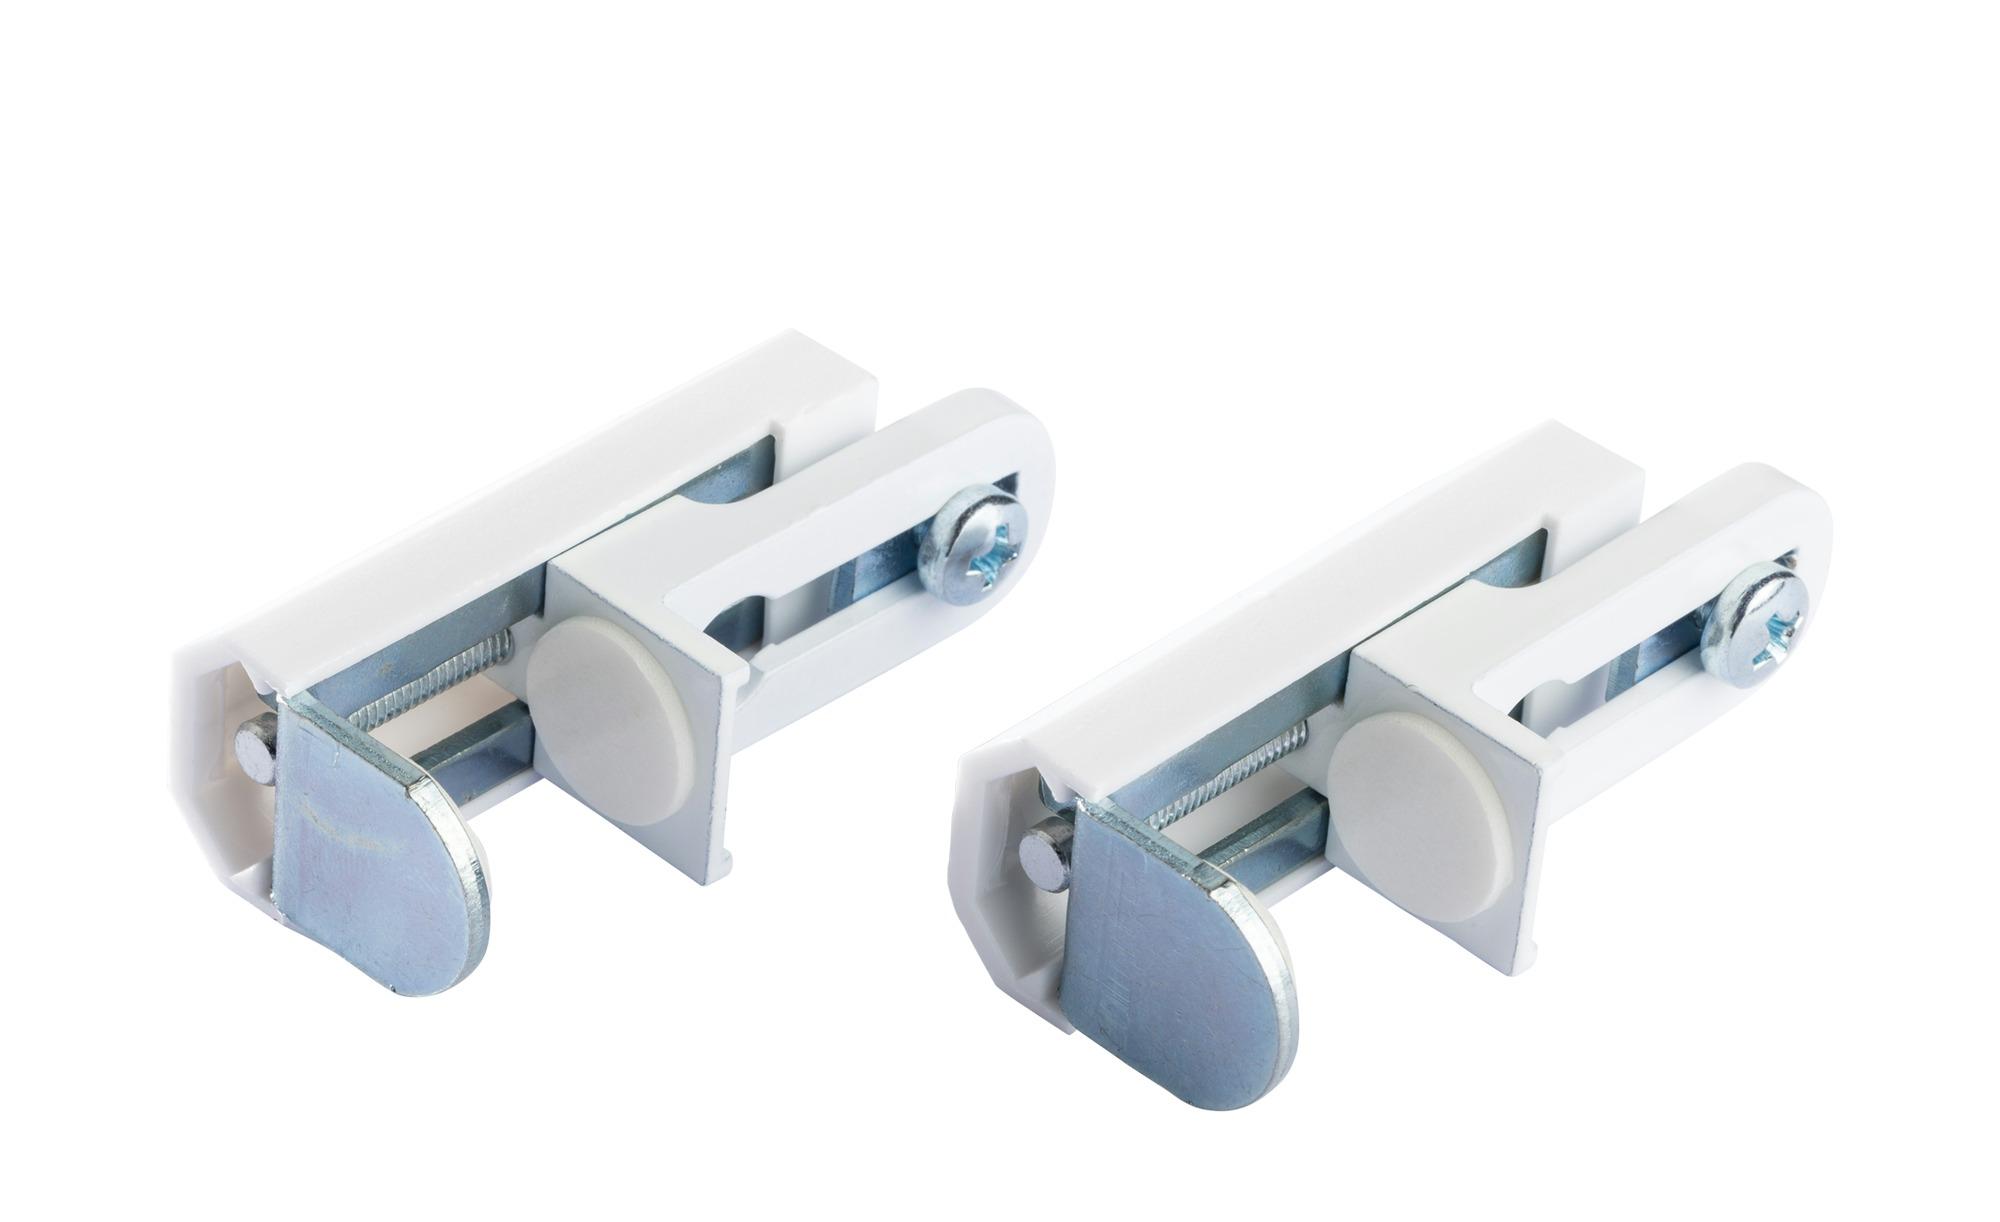 Klemmträger für Doppelrollo / Faltstore - Kunststoff - Gardinen & Vorhänge ></noscript> Rollos & Sonnenschutz > Rollo Zubehör - Möbel Kraft